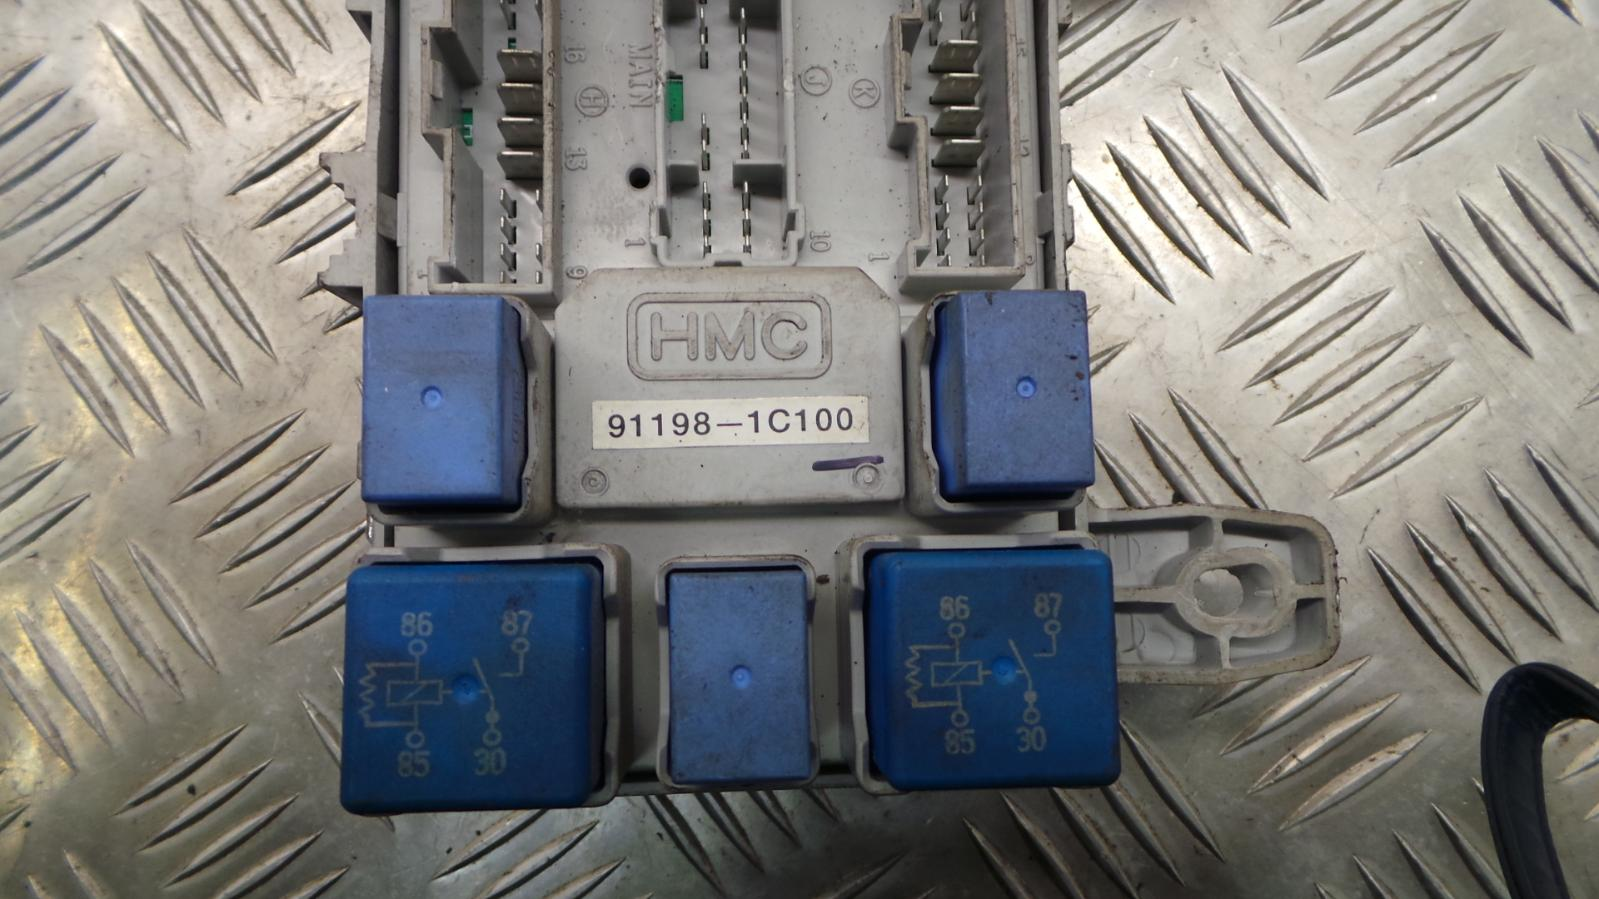 2003 Hyundai Getz 13 Petrol Manual Ignition Kit Engine Ecu Fuse Box Astra Gsi 5 Of 12